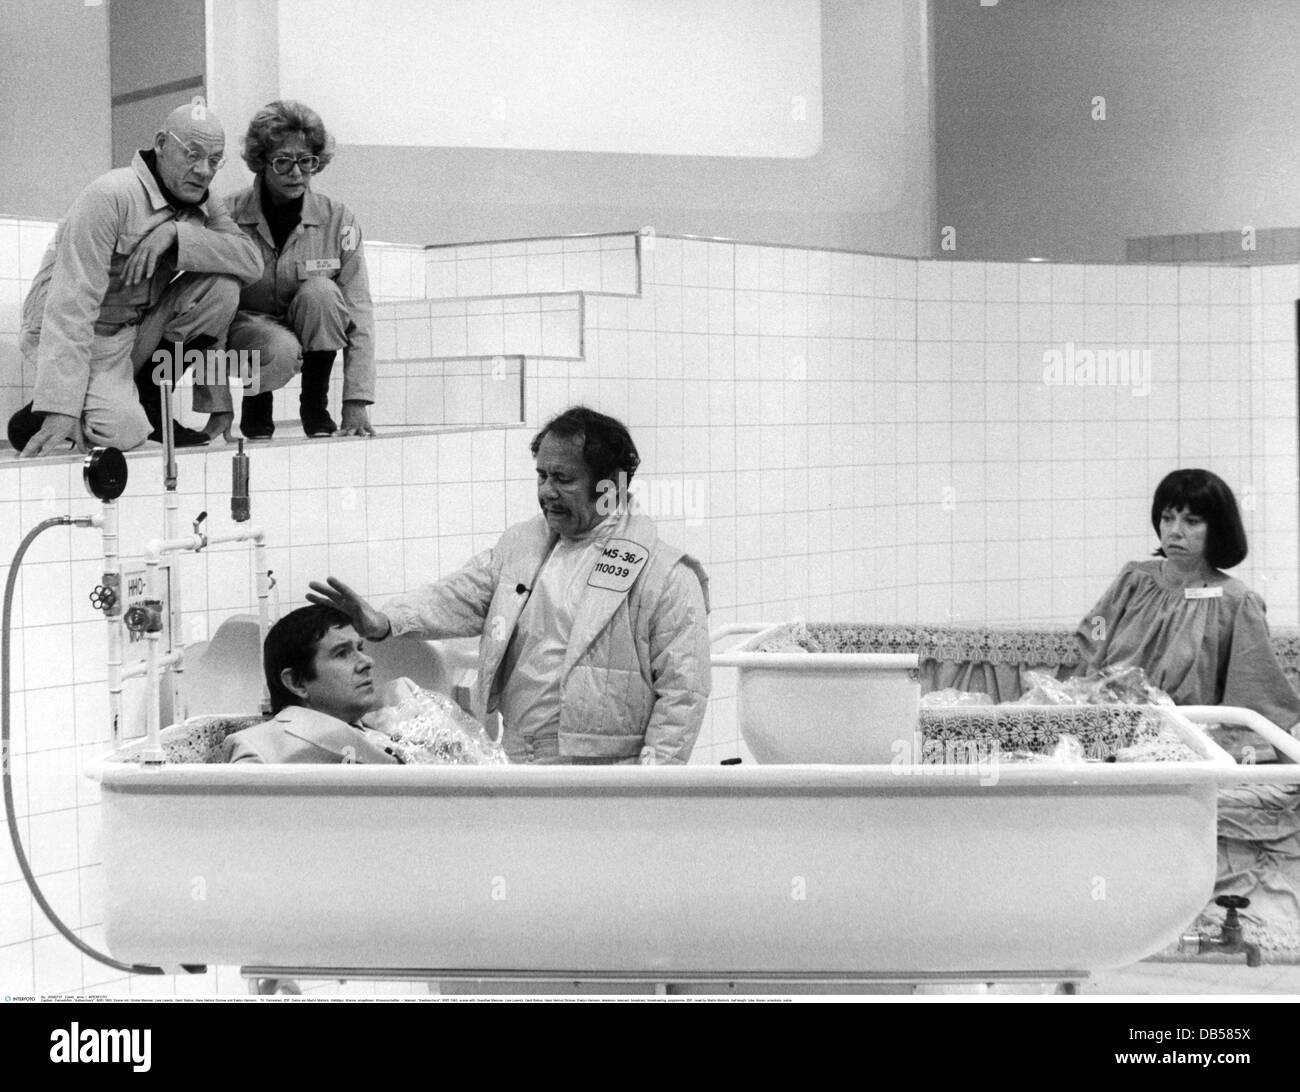 Teletrasmissione, 'Kaelteschock', BRD 1983, Scena con: Guenther Meisner, Lore Lorentz, Gerd Baltus, Hans Immagini Stock